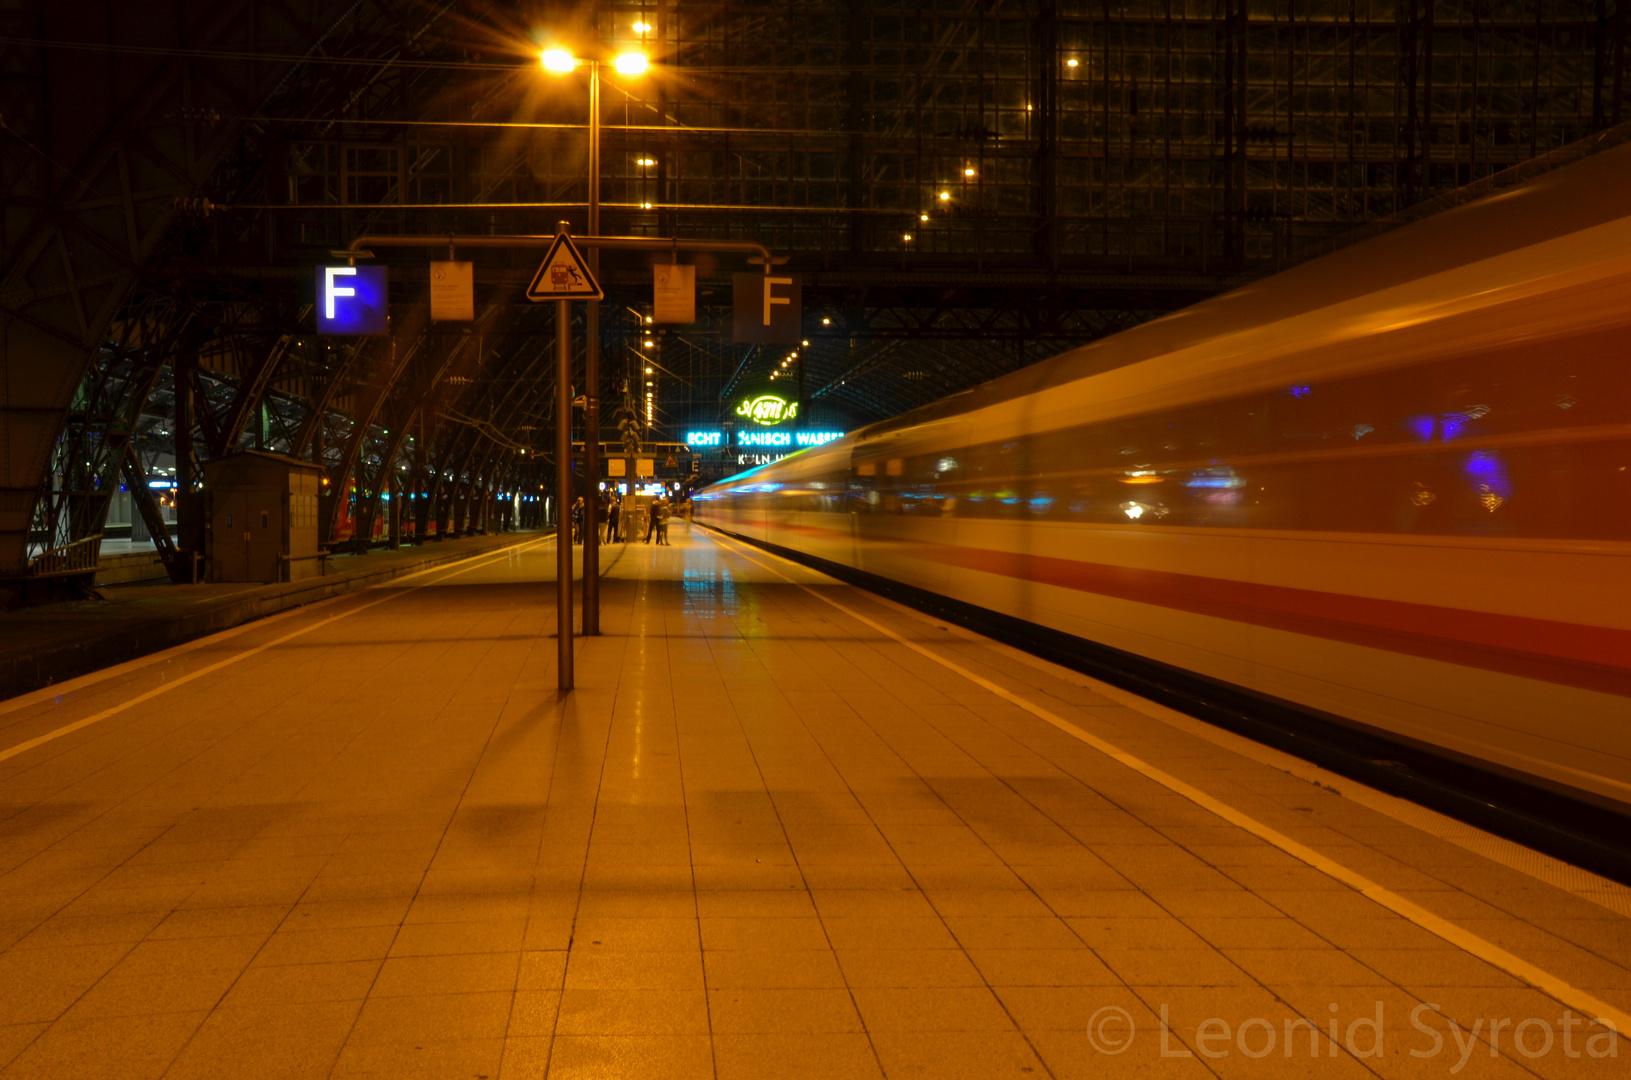 Eisenbahnverkehr am Kölner Hauptbahnhof abends